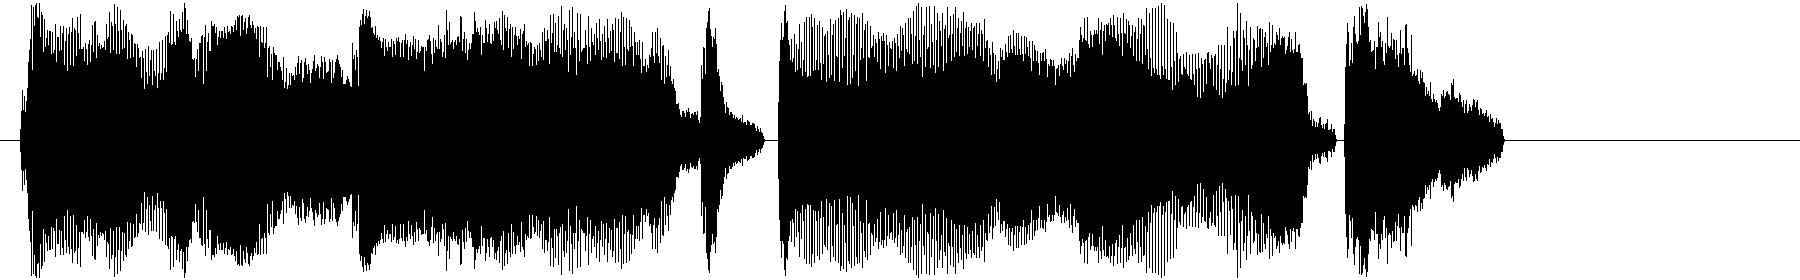 005 female